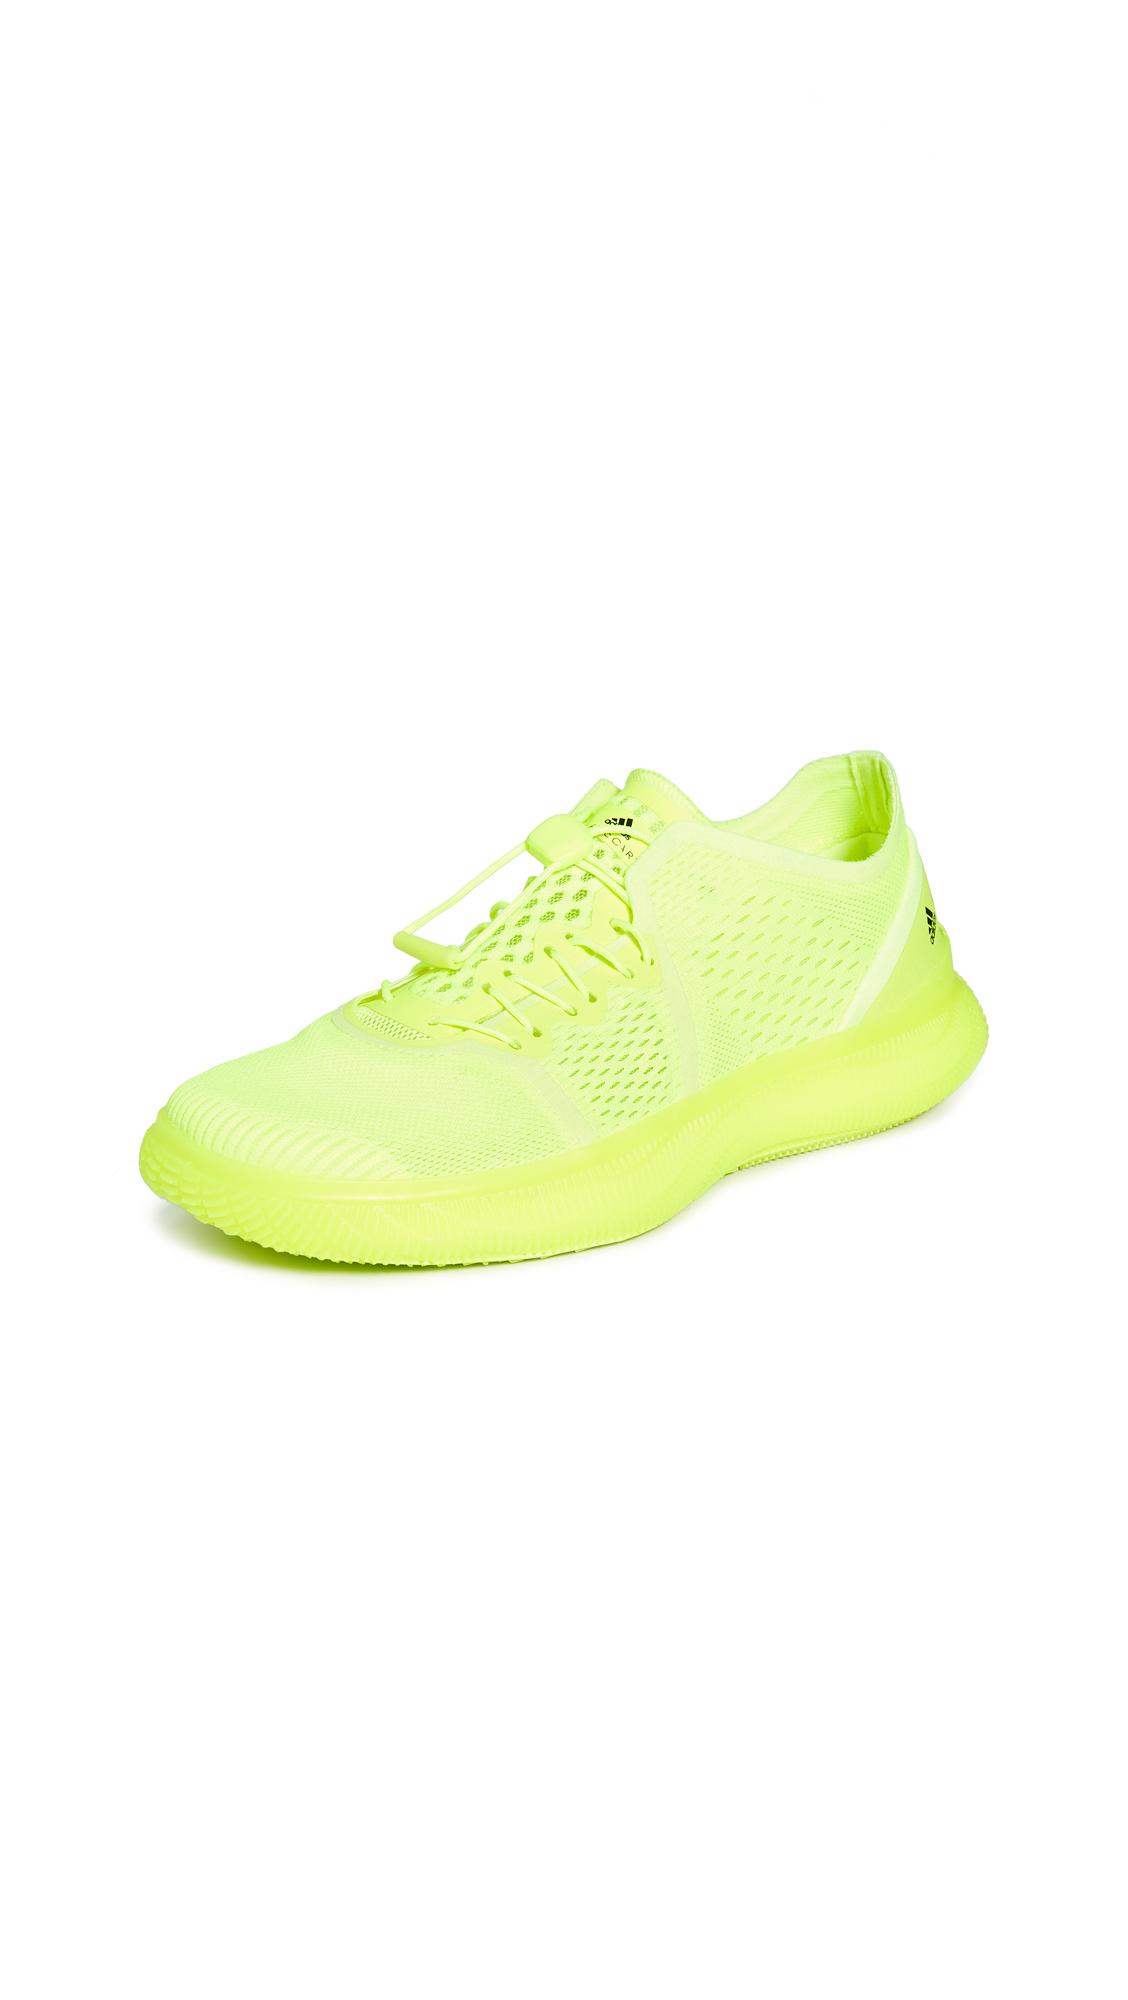 adidas by Stella McCartney Pureboost Trainer S. Sneakers - Solar Yellow/Cream White/Solar